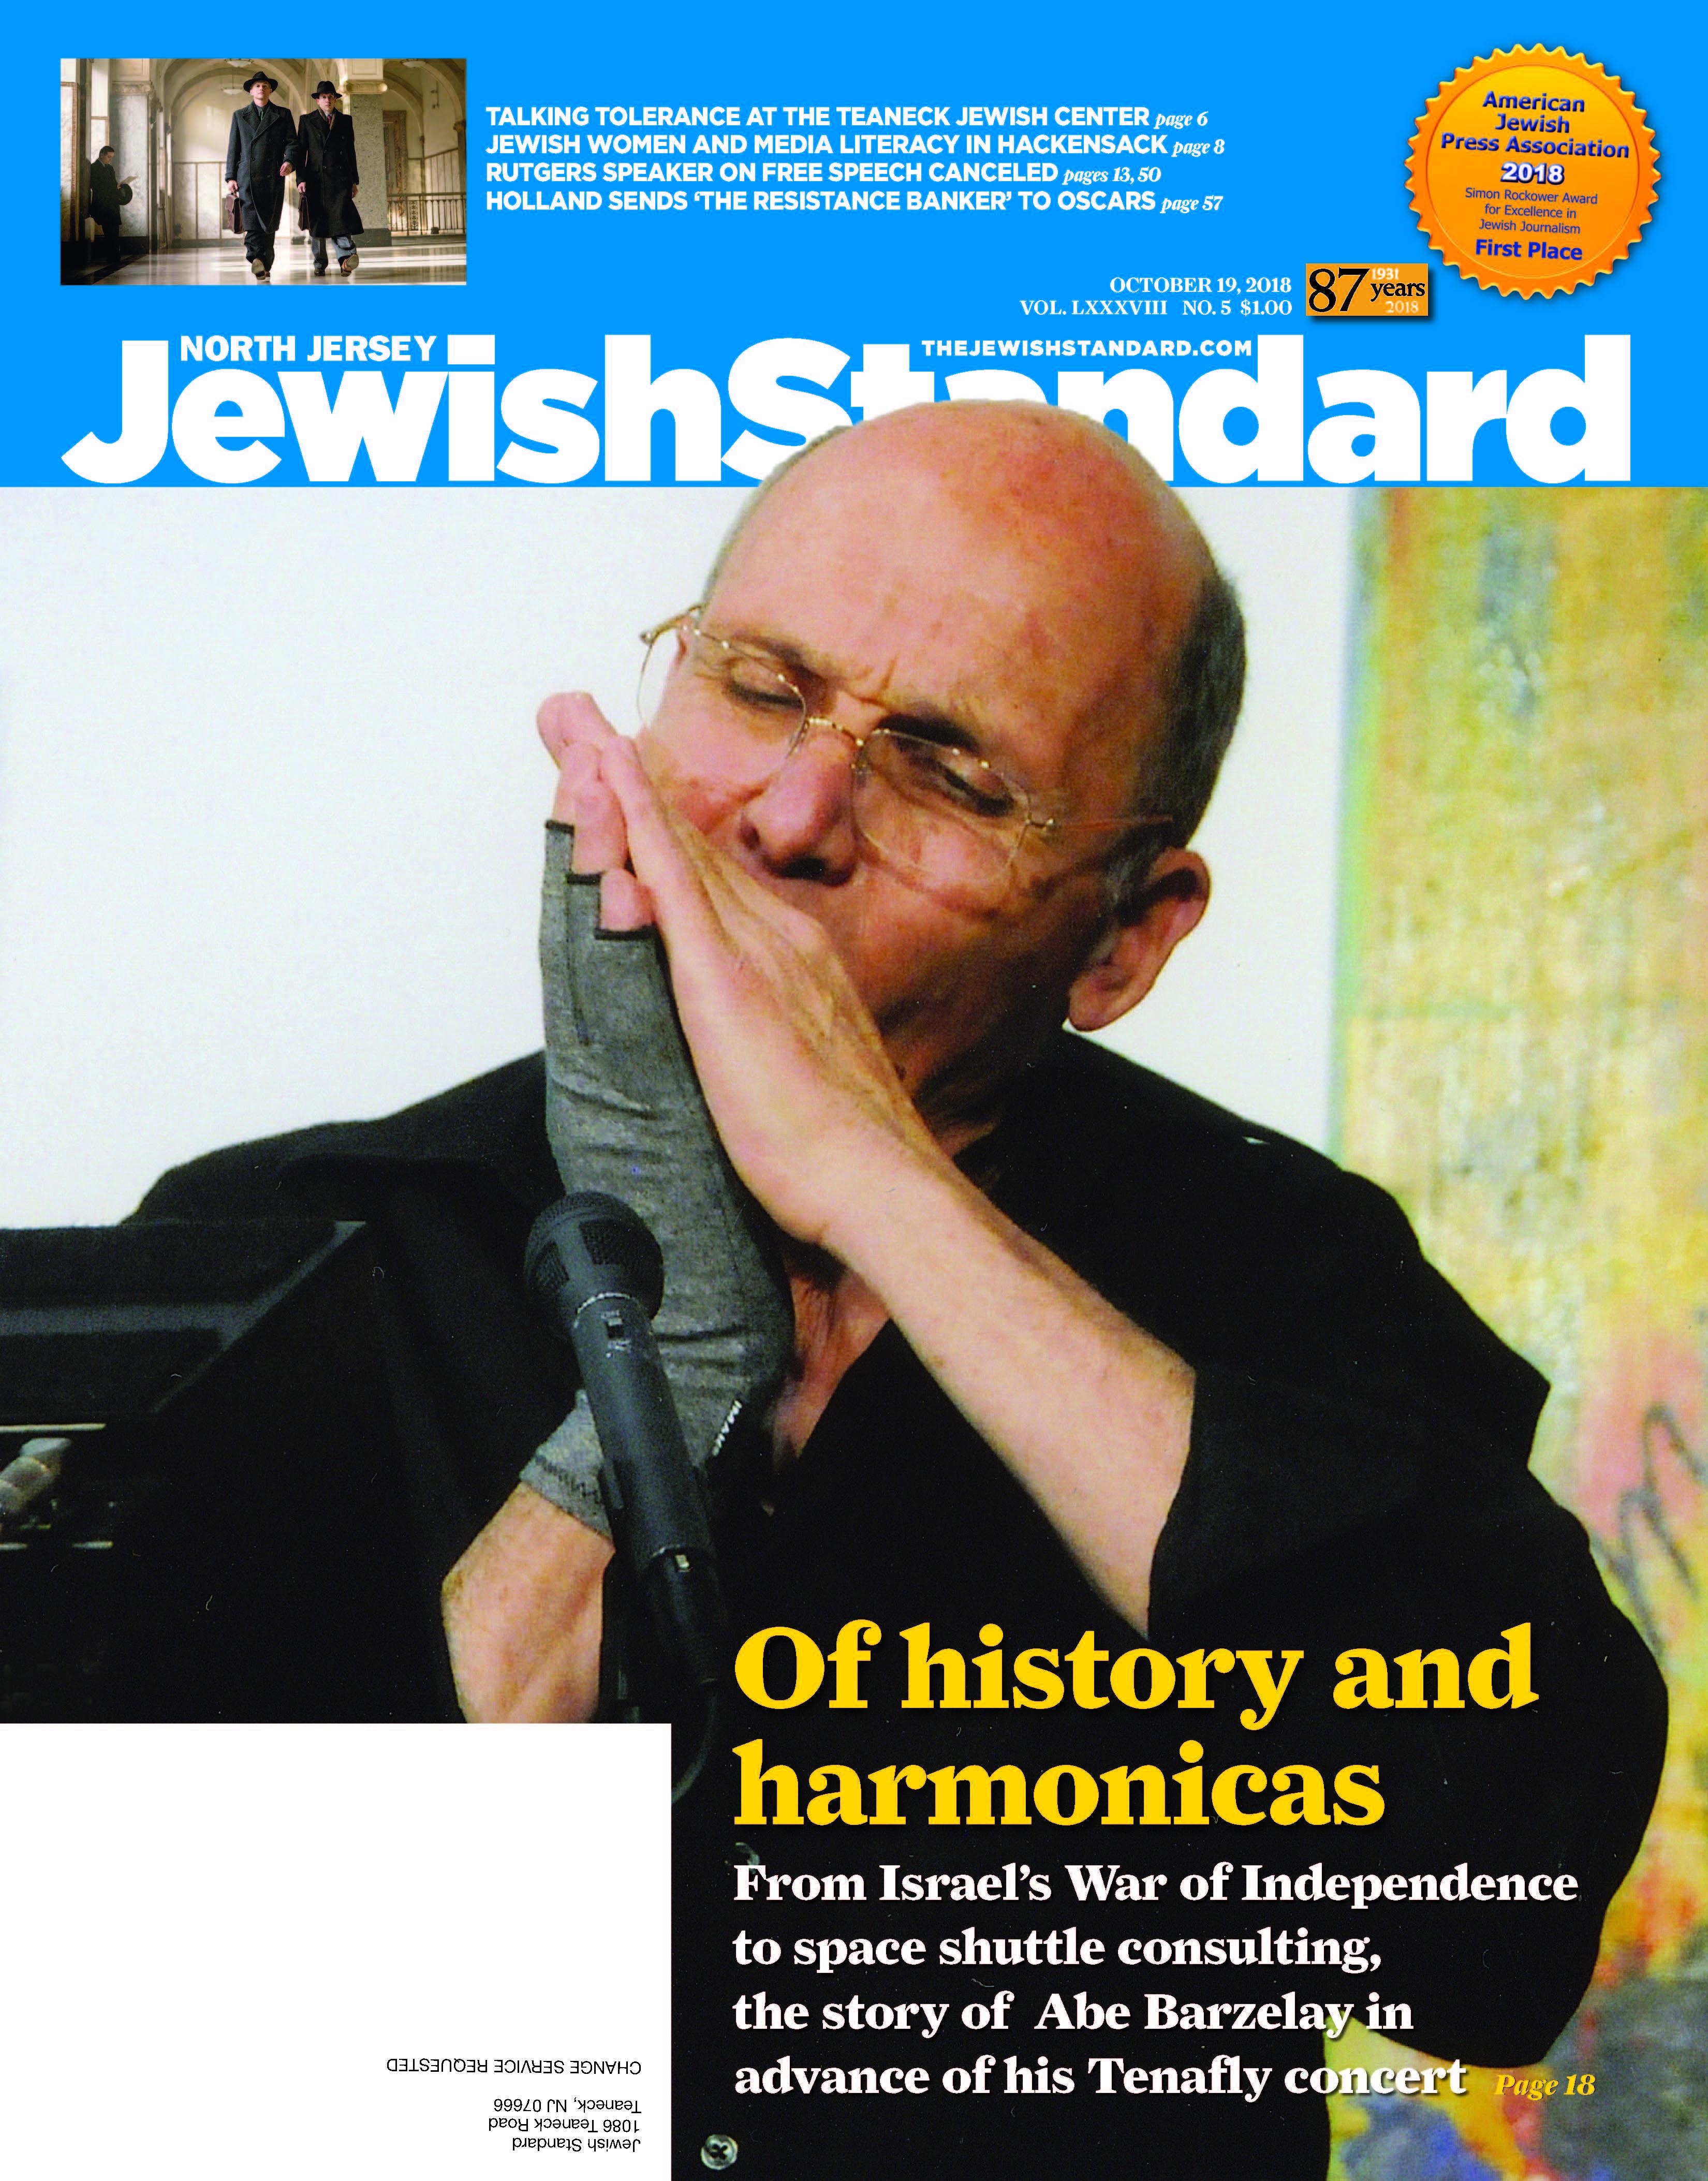 Jewish Standard, October 19, 2018